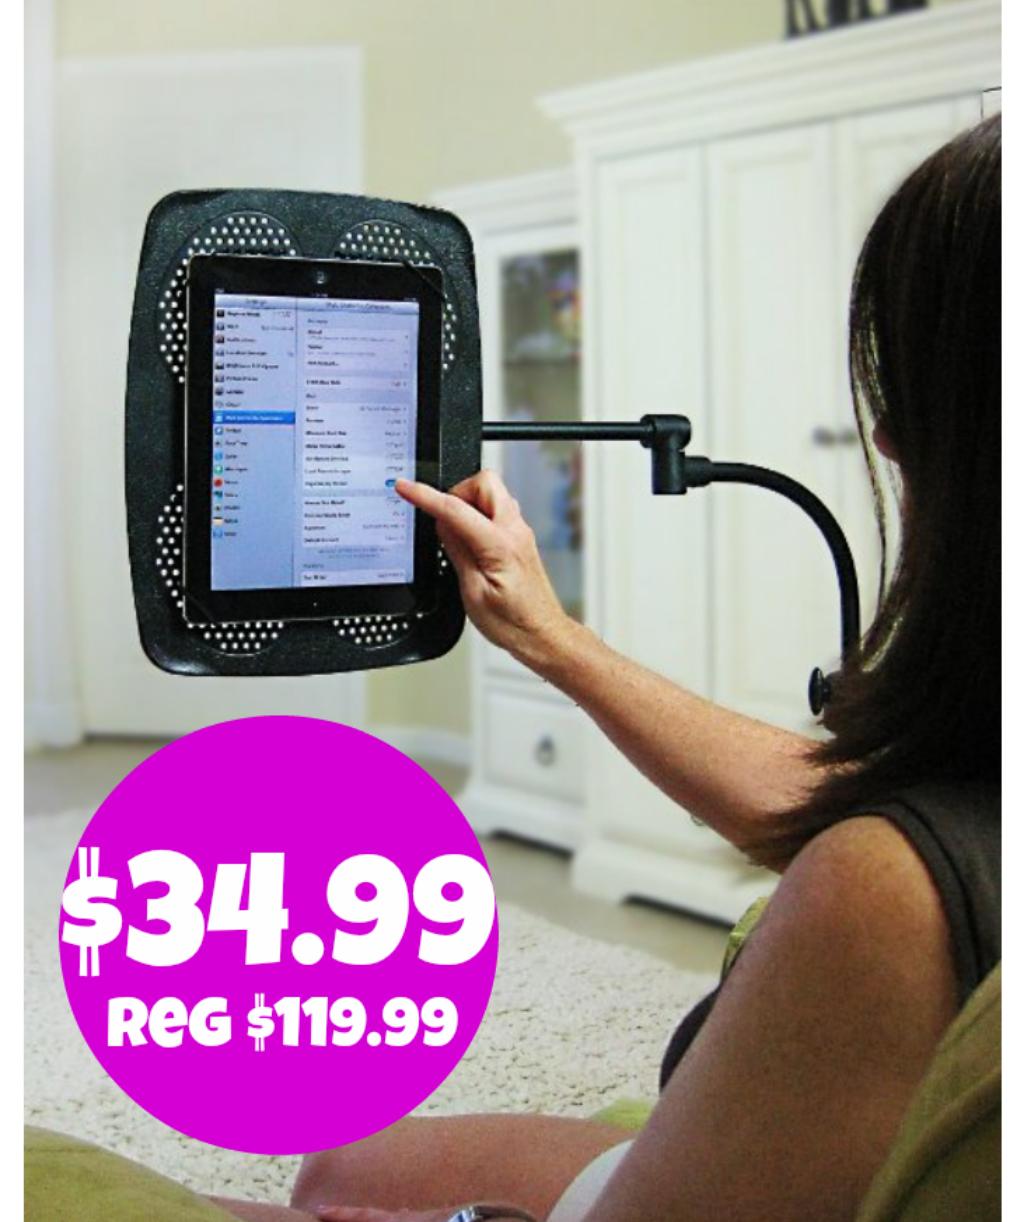 http://www.thebinderladies.com/2015/02/amazon-levo-g1-compactclamp-for-tablets.html#.VNuyDofduyM